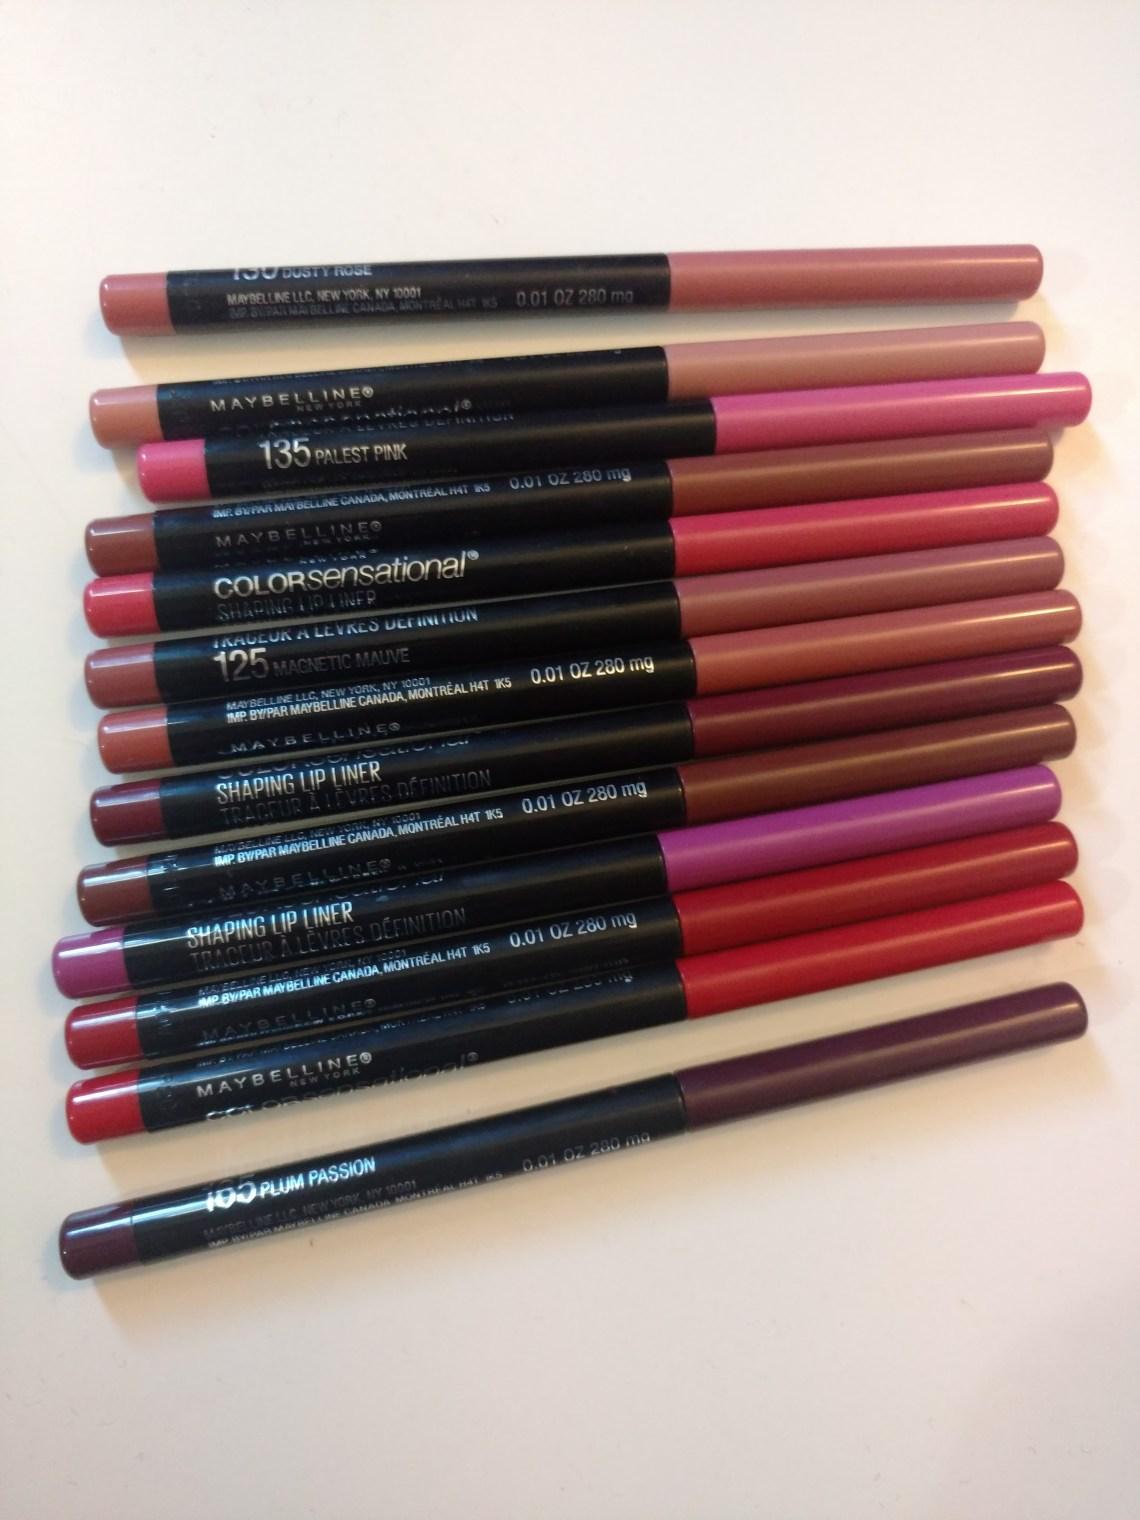 https://www.maybelline.com/lip-makeup/lip-liner/color-sensational-shaping-lip-liner/clear